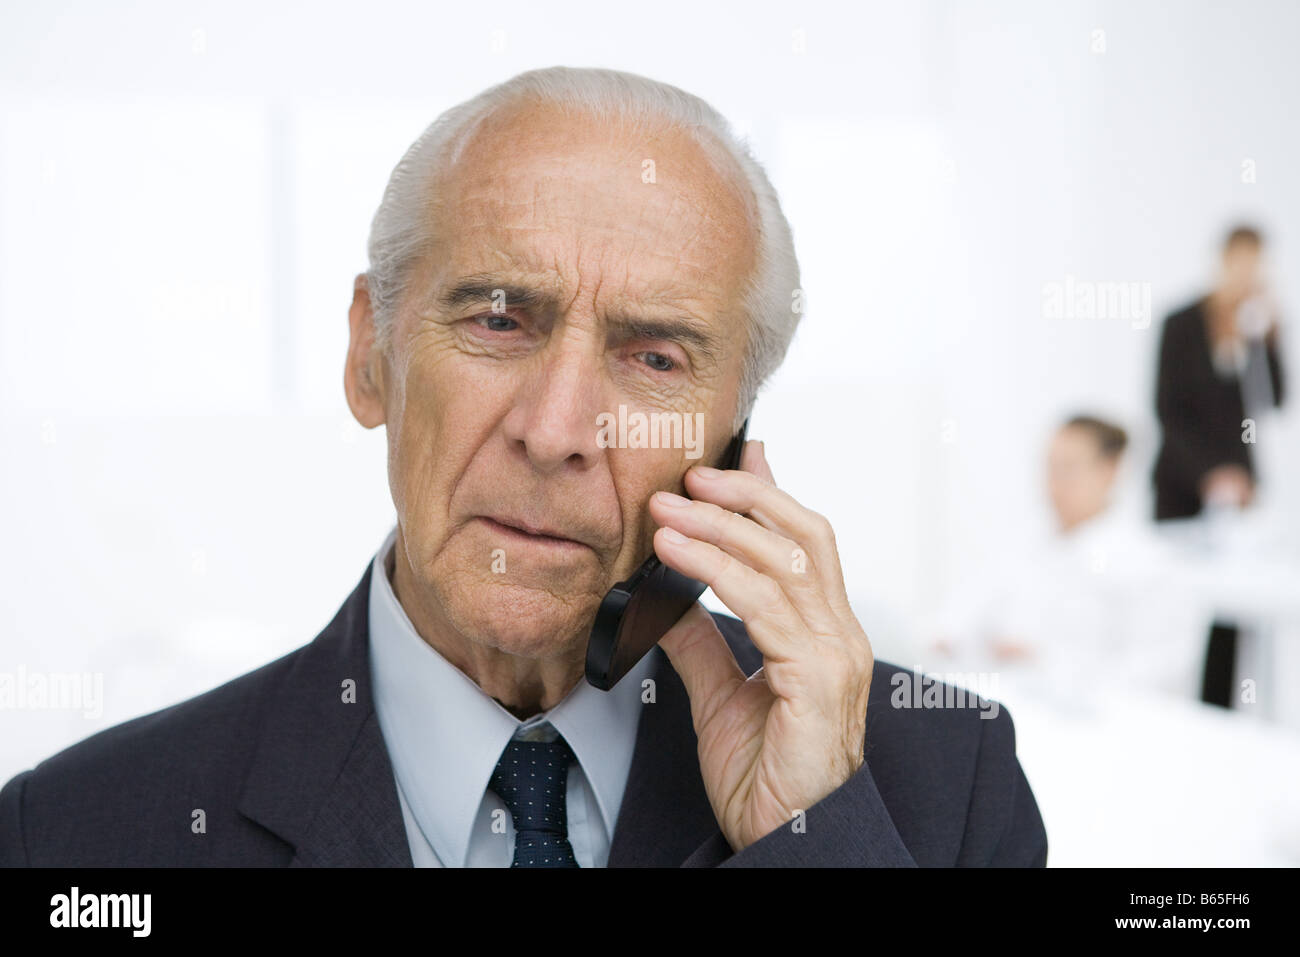 Senior businessman using cell phone, furrowing brow - Stock Image